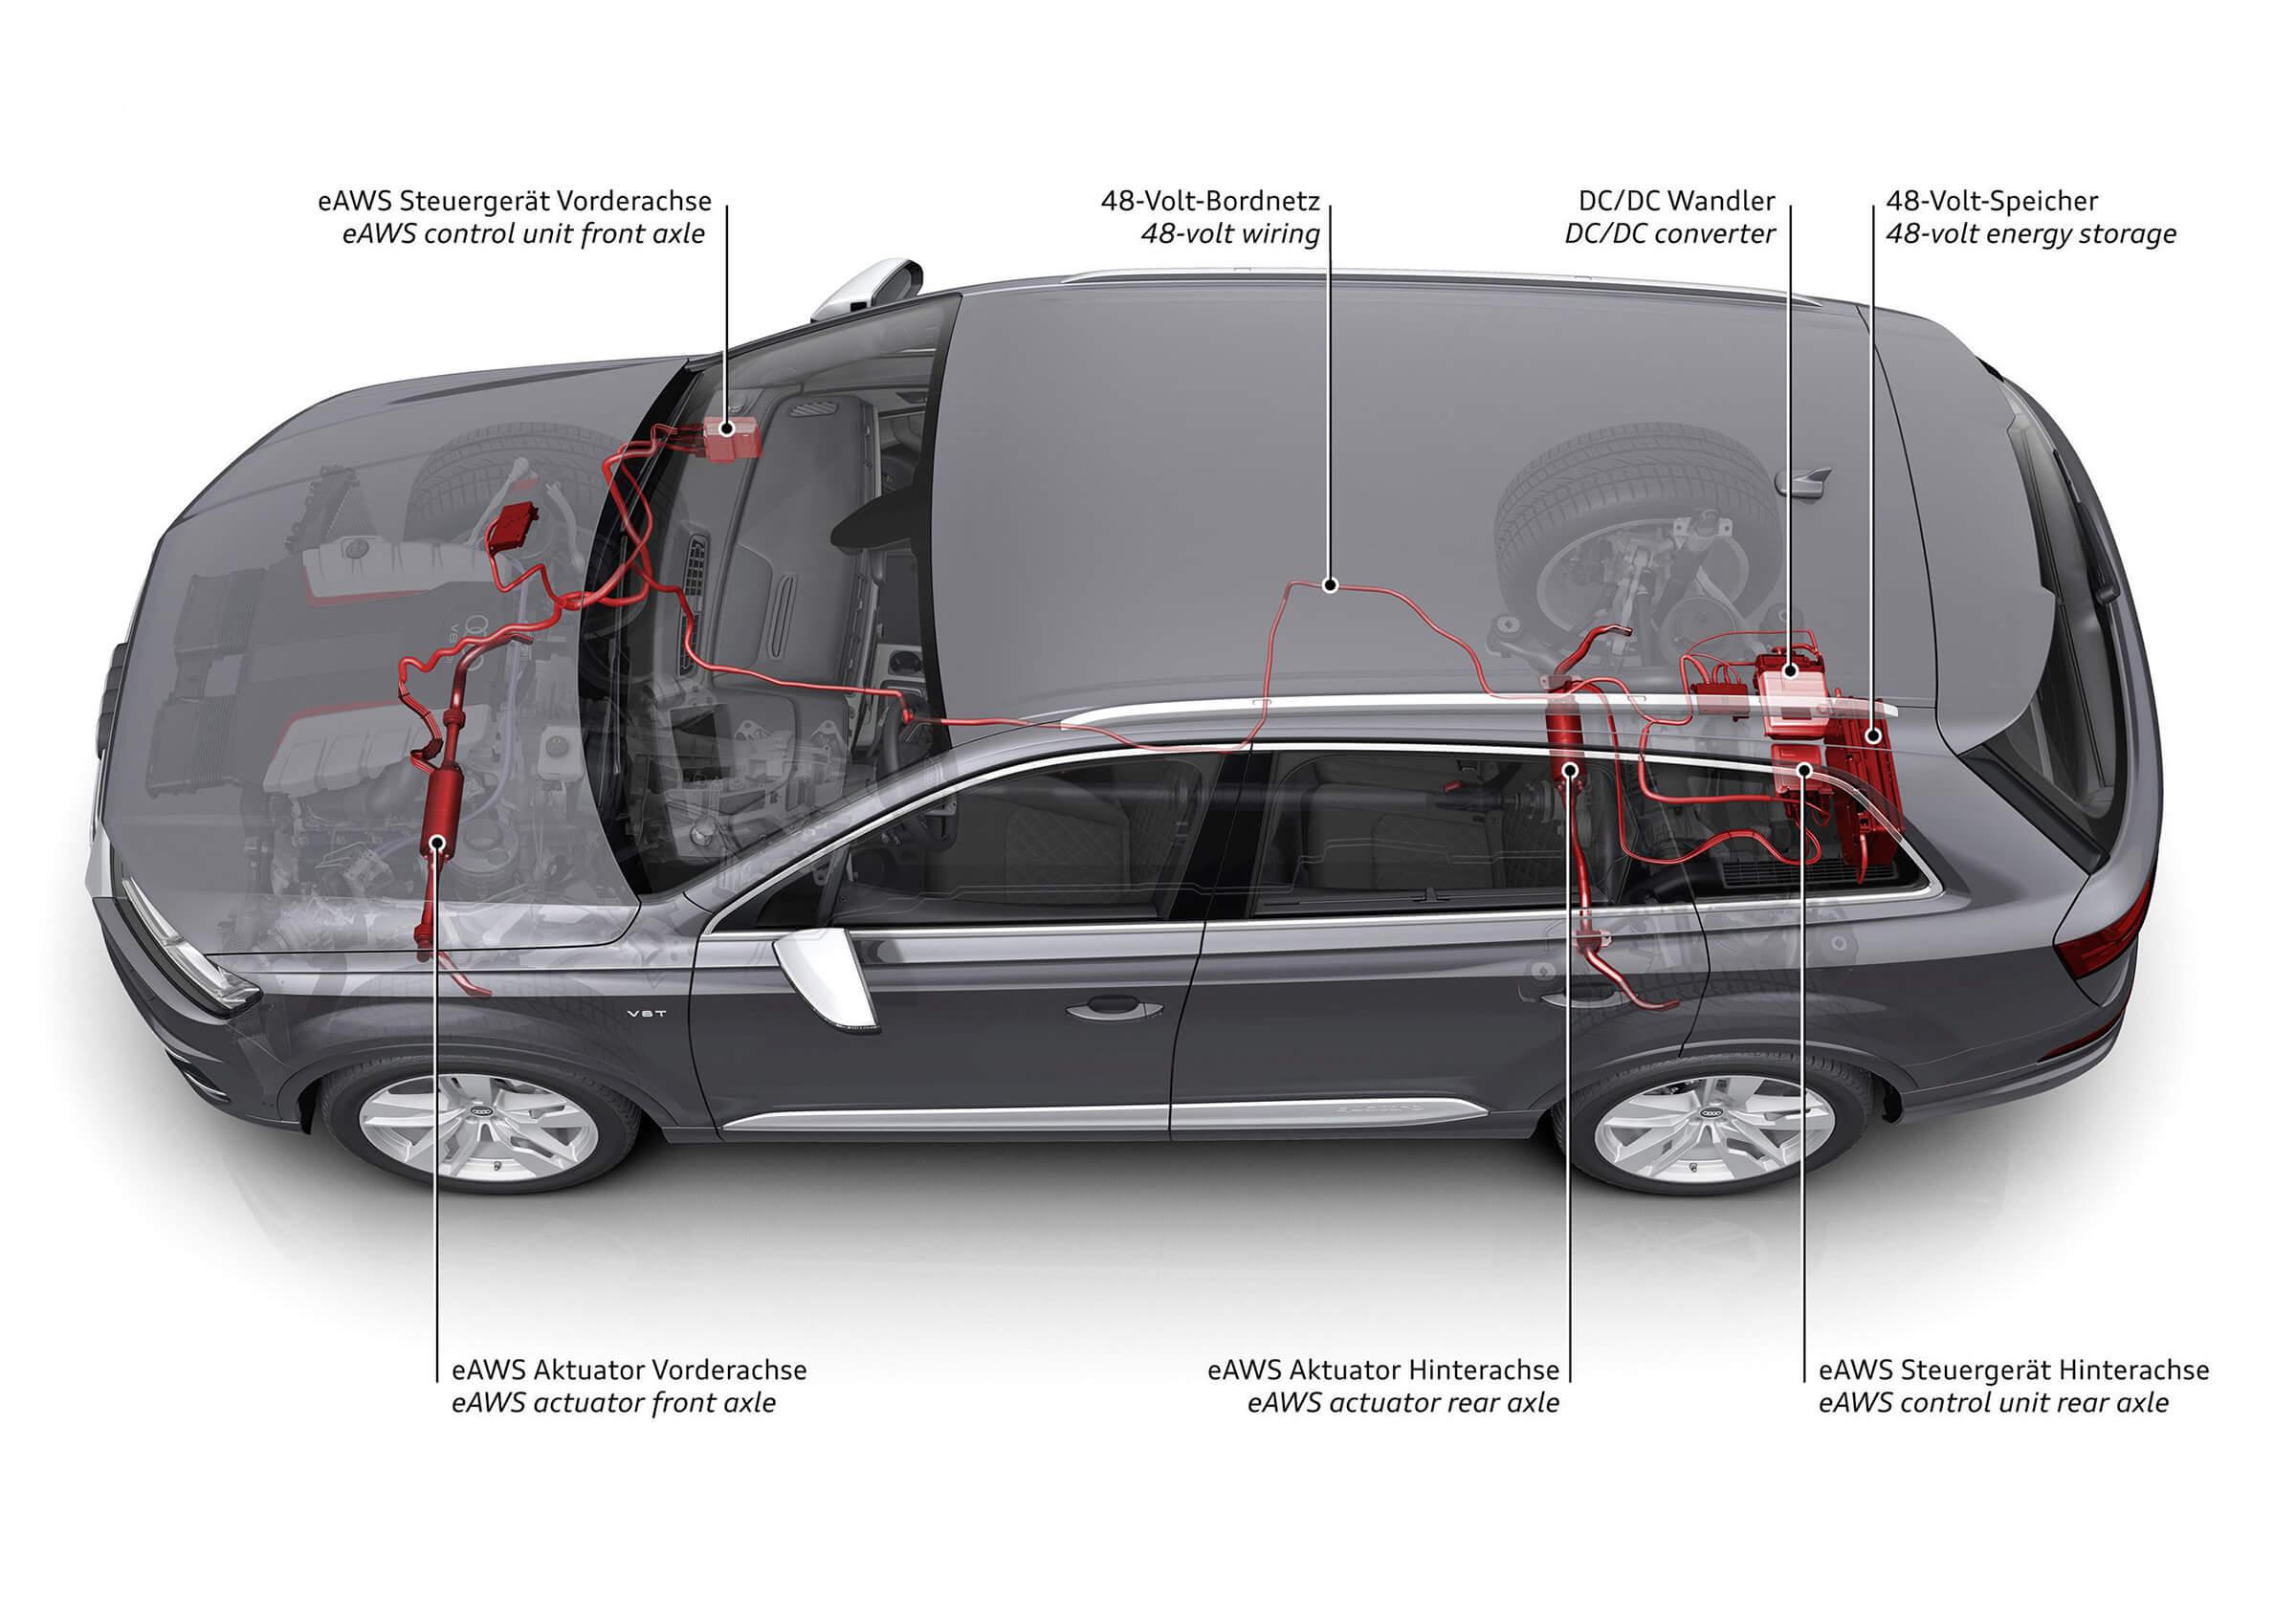 Audi Ηλεκτρομηχανική σταθεροποίηση κλίσης eAWS